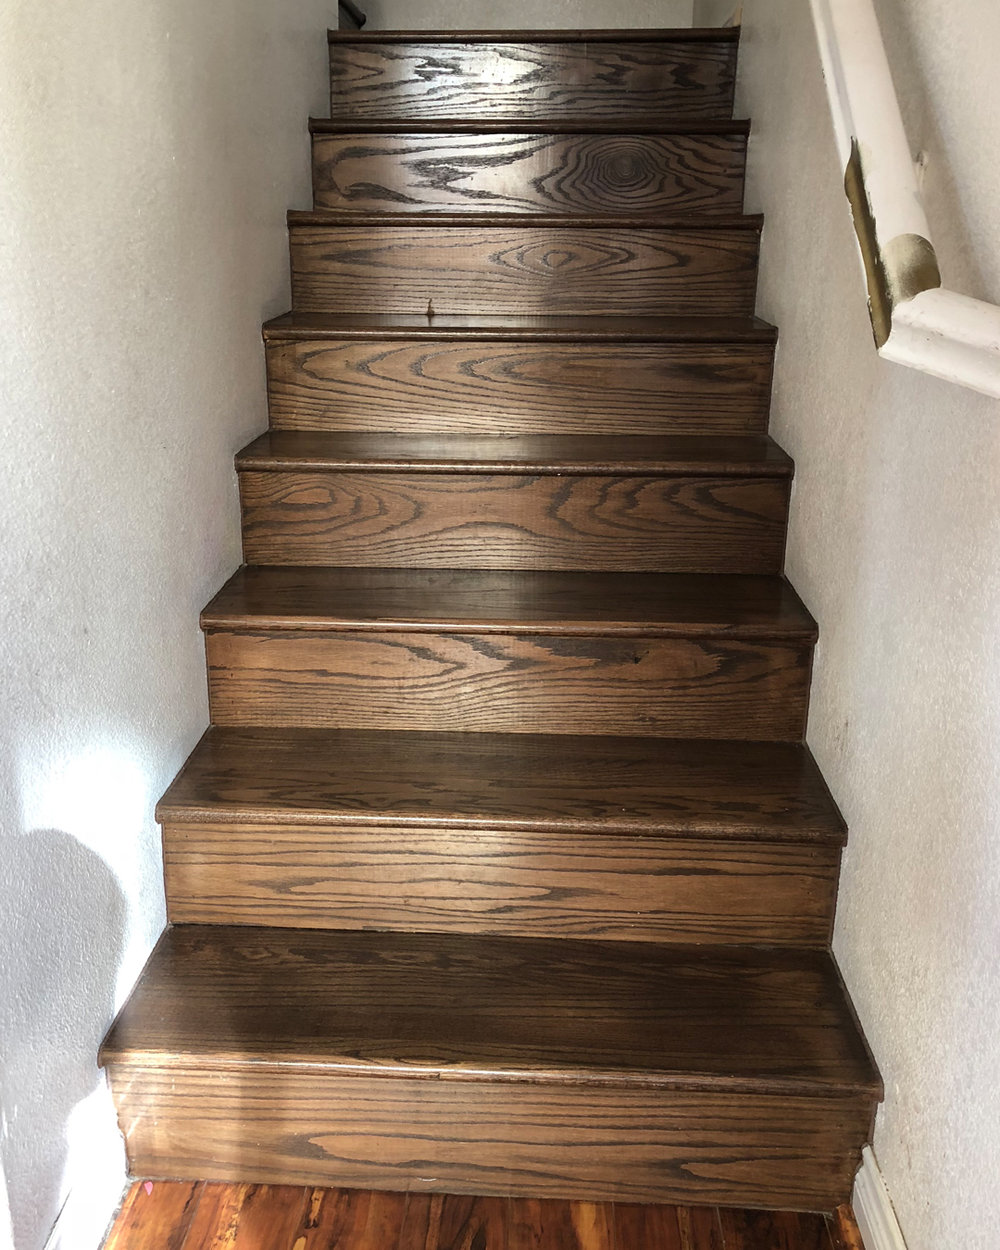 chalk-painted-stairs-1.jpg